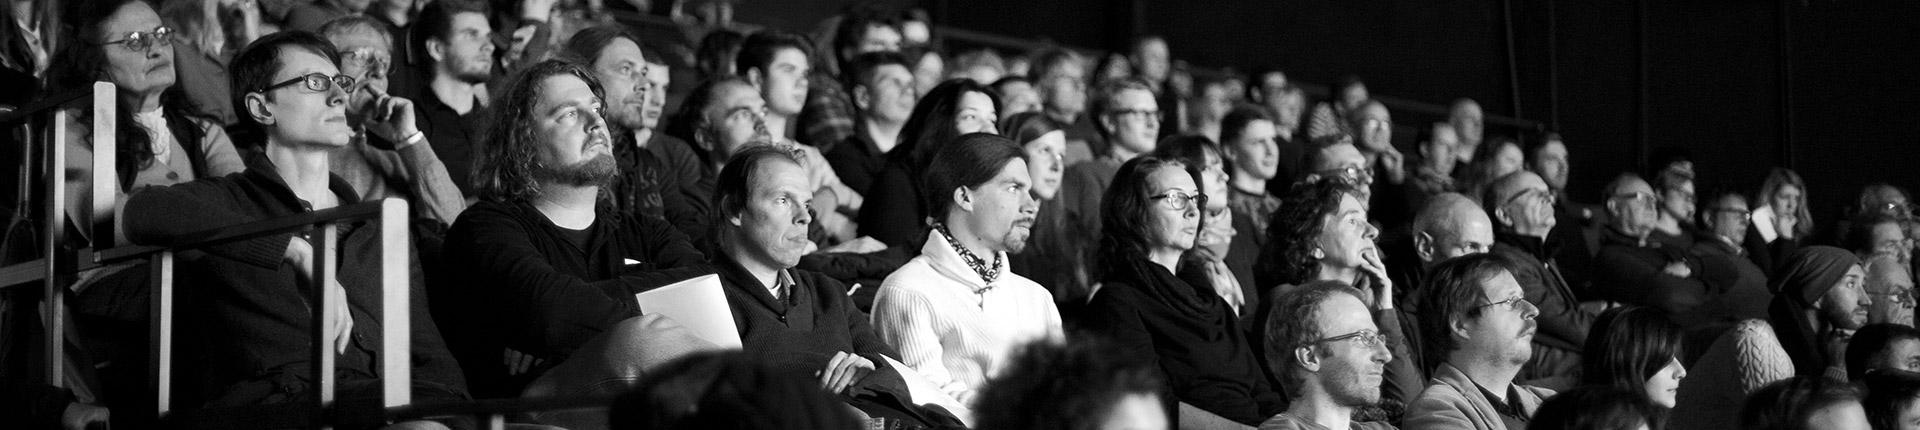 Kurzfilmwettbewerb Bilderbeben, Publikum